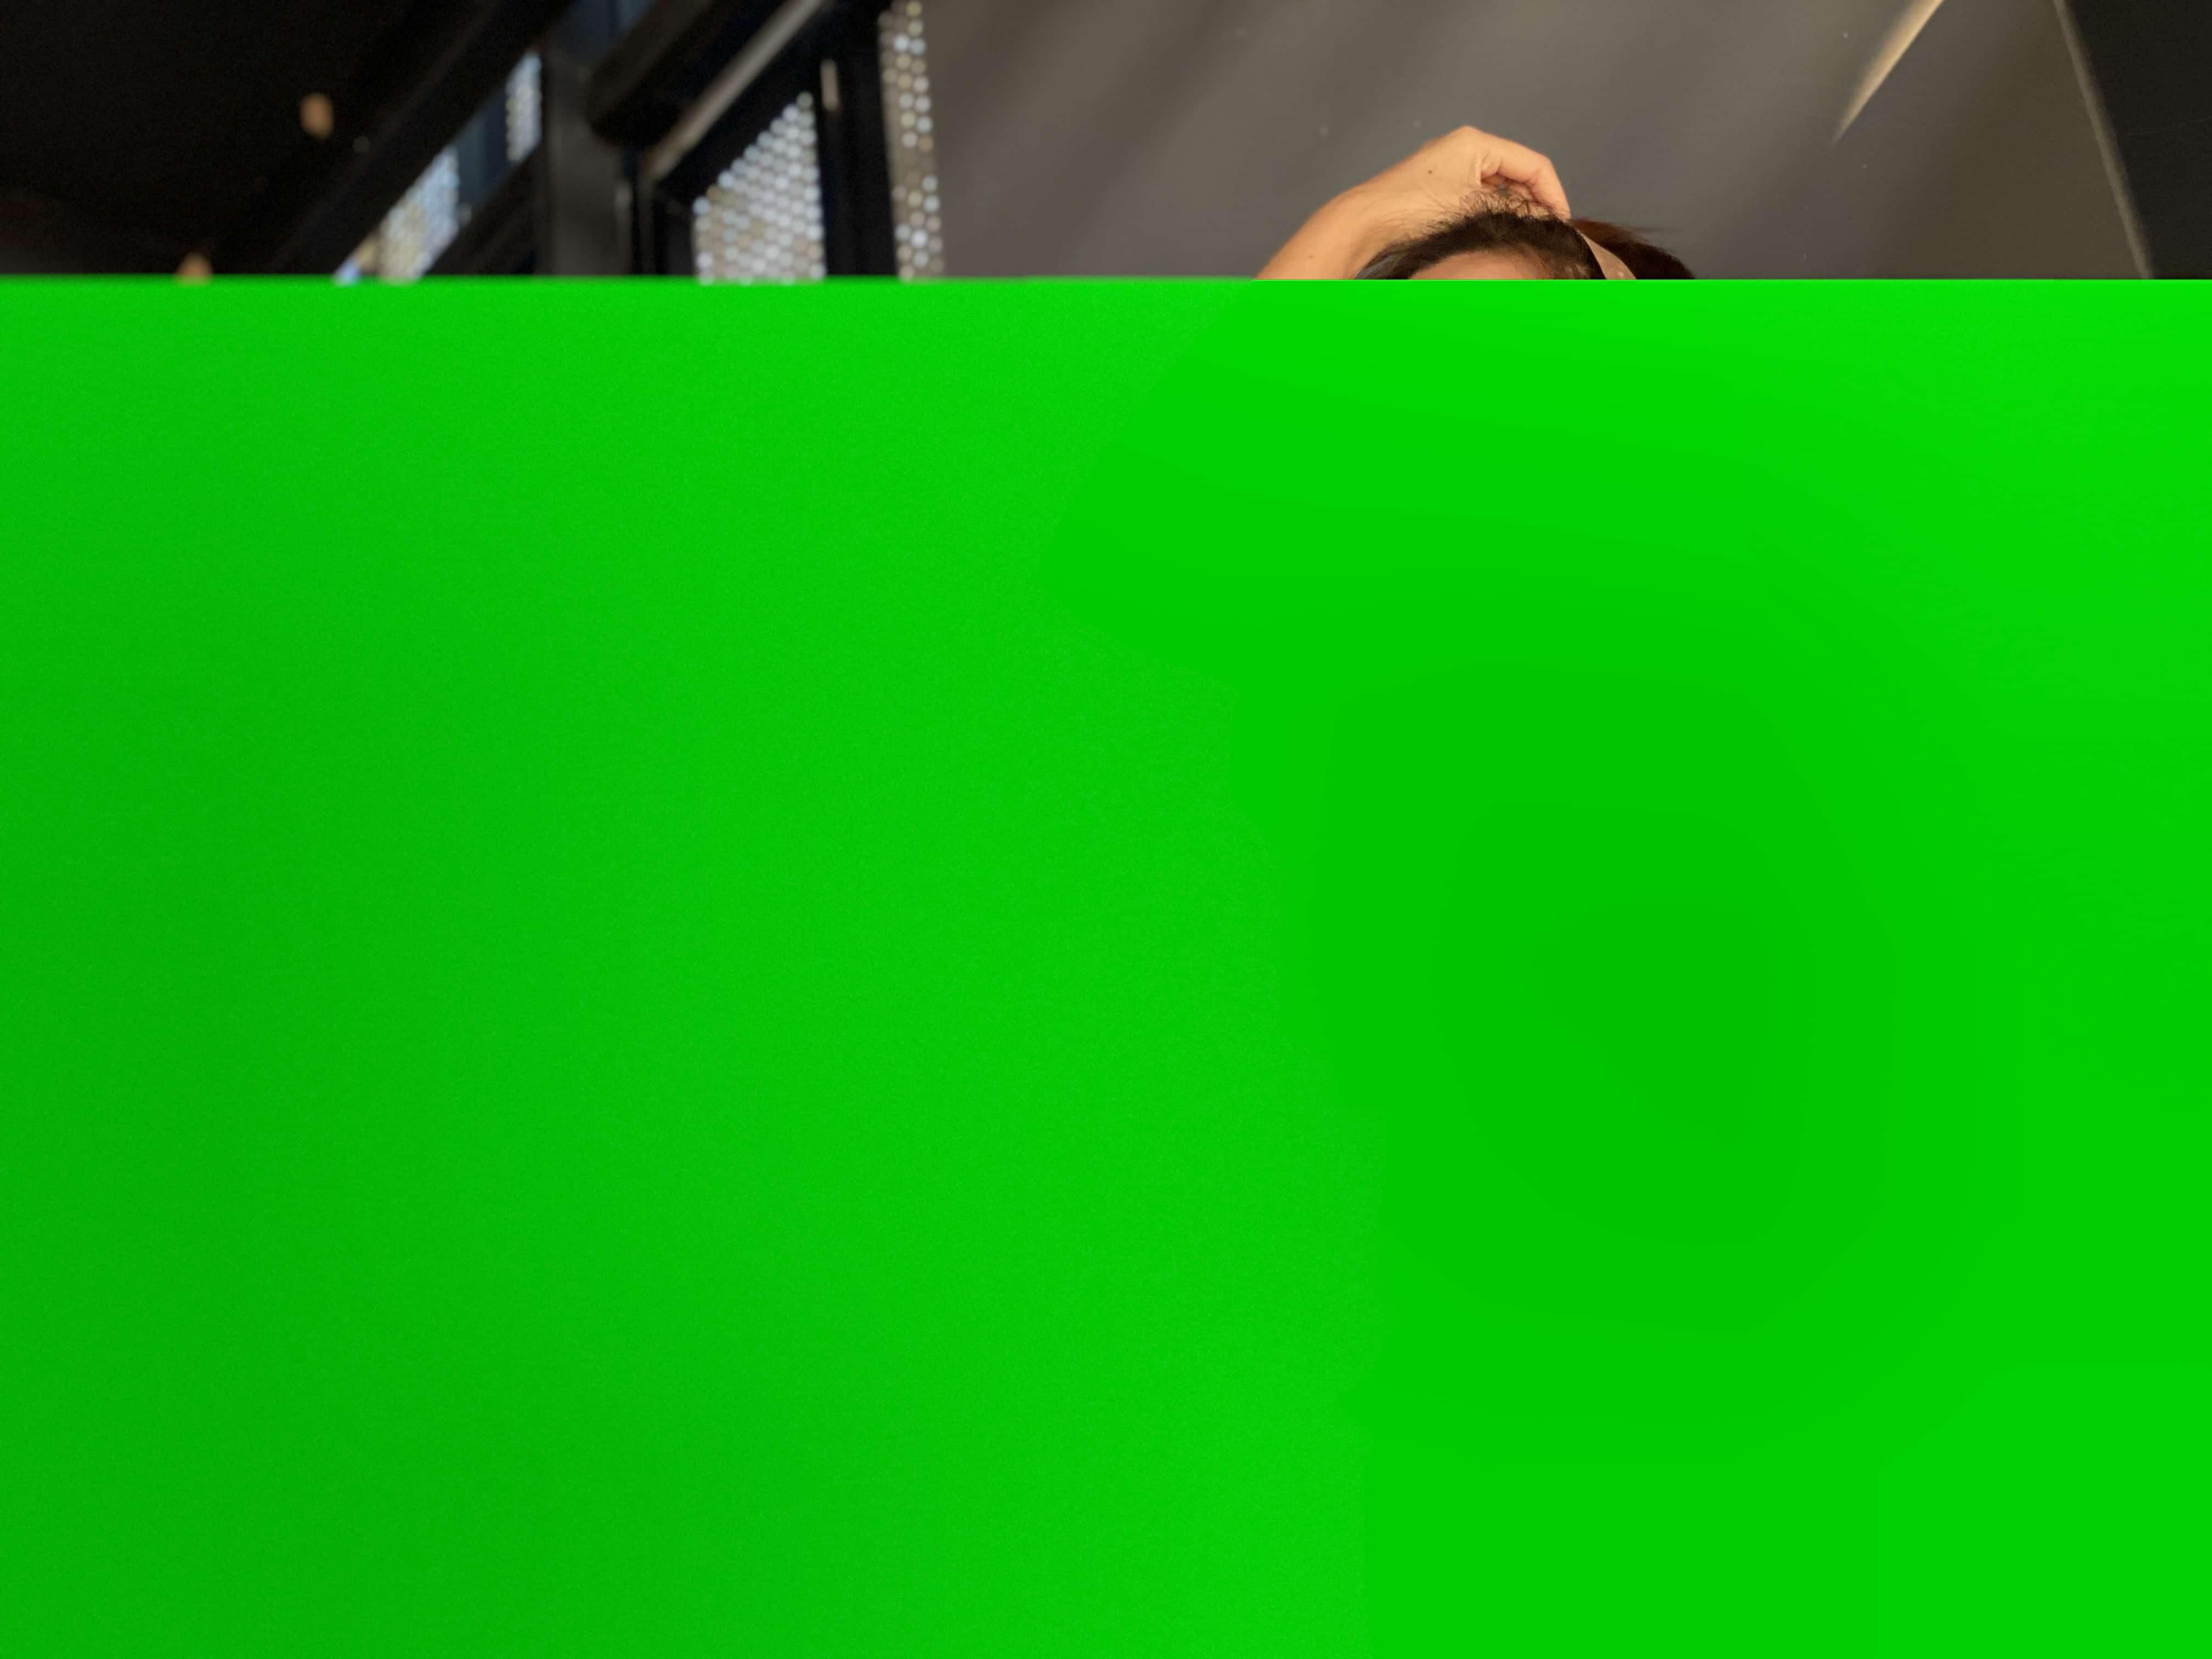 Iphone 11 Pro Max Green Image Ios 13 4 Beta Bug Img 11